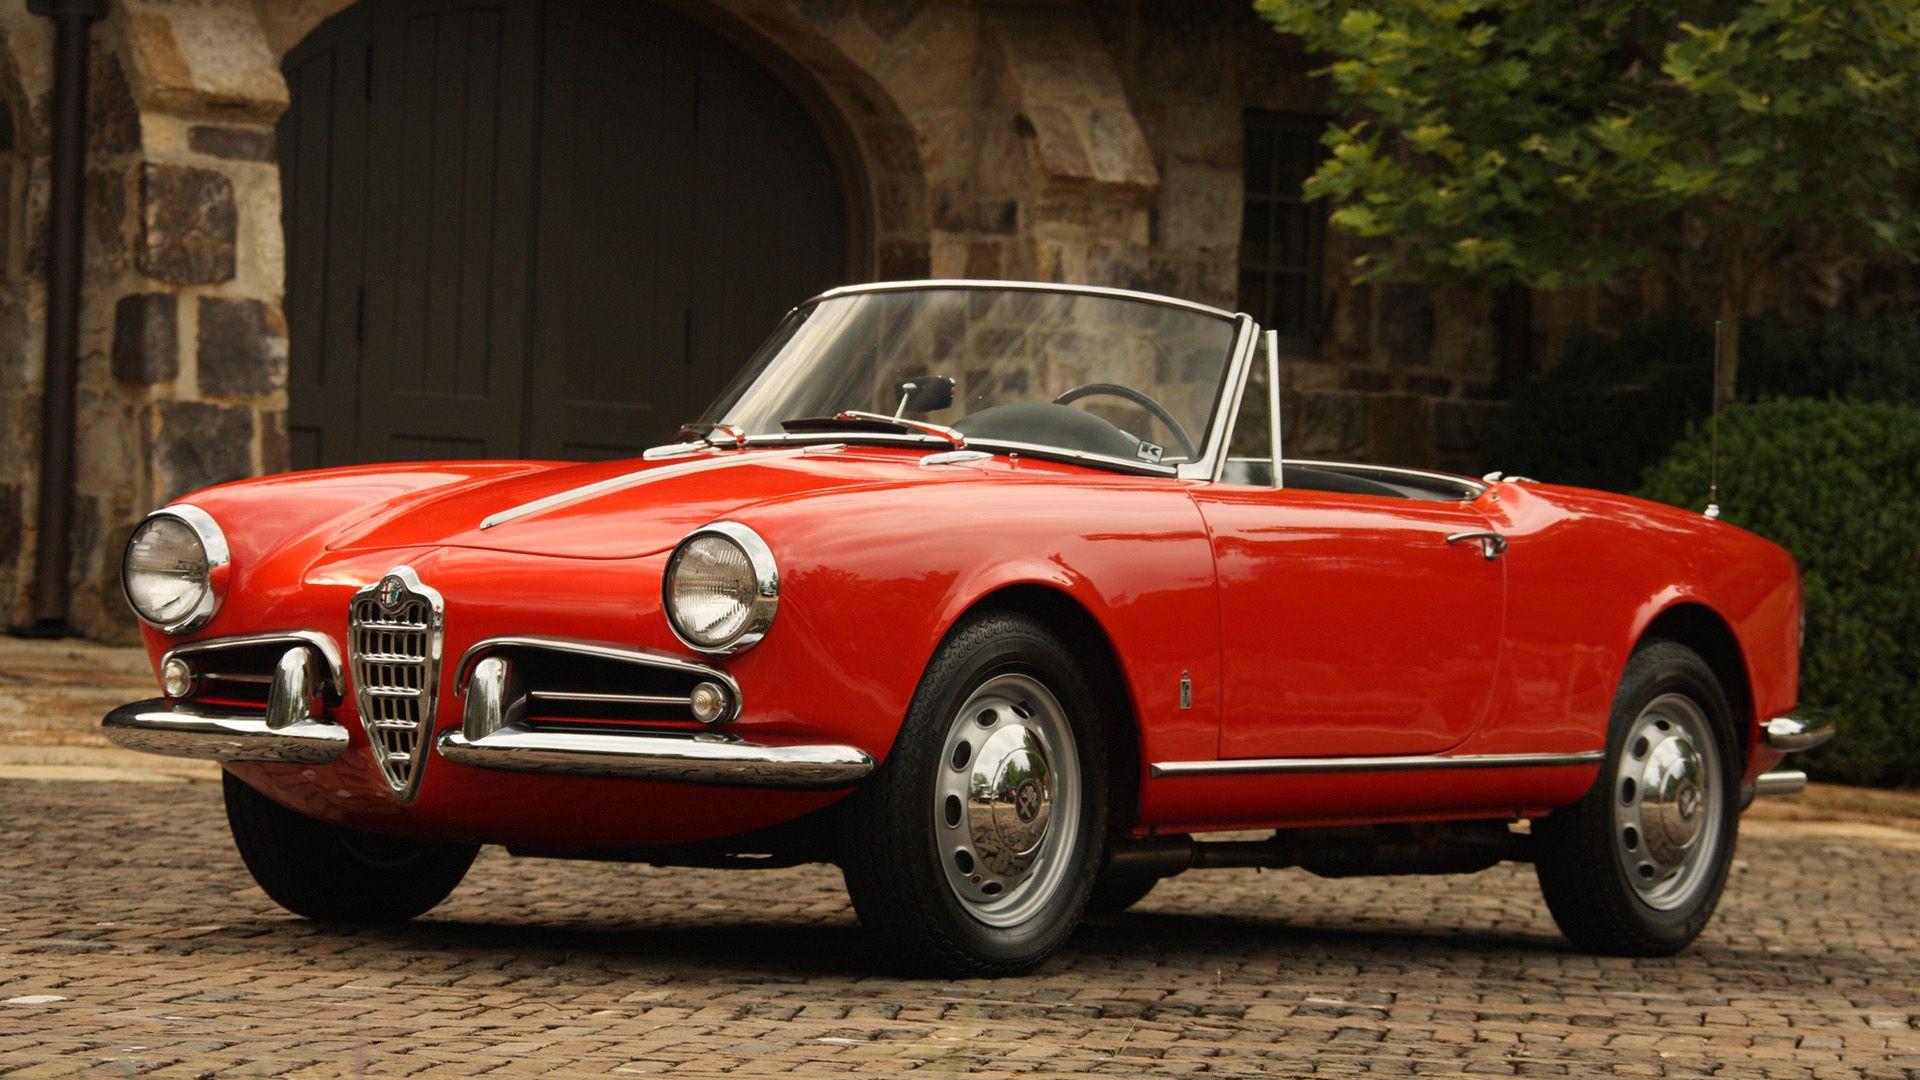 Alfa Romeo Giulietta Spider Most Beautiful Cars In The